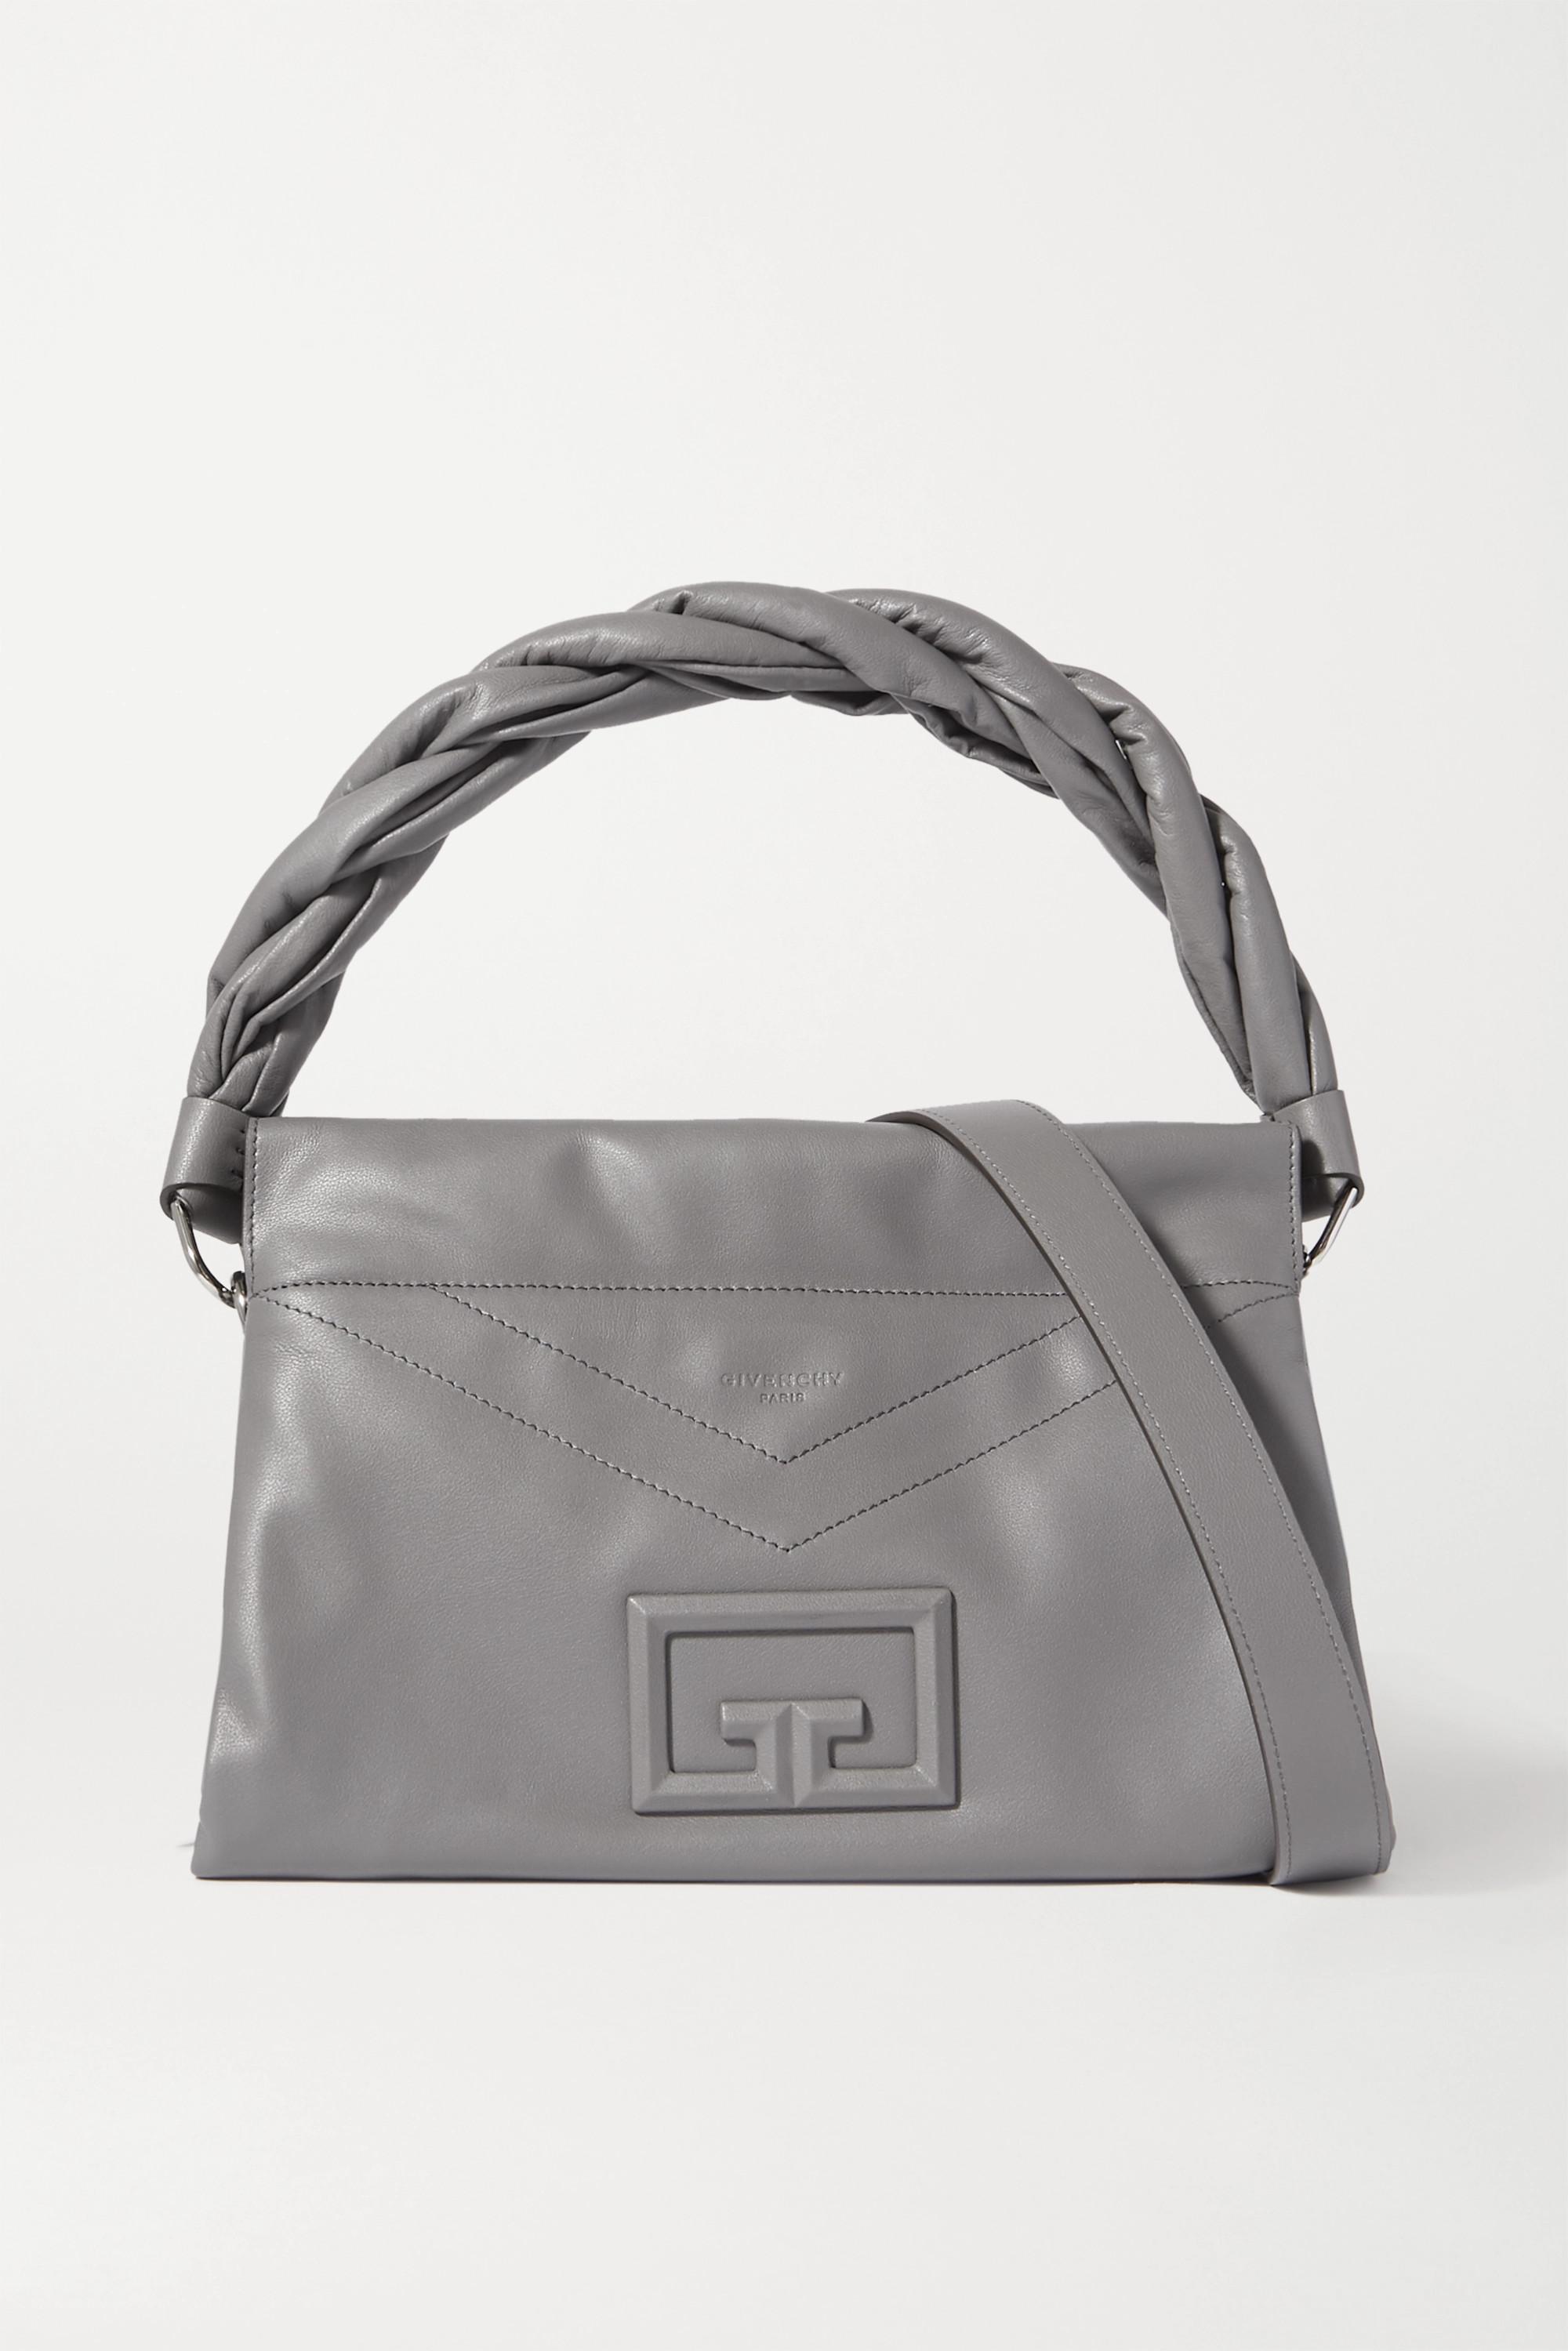 Givenchy ID93 皮革中号单肩包